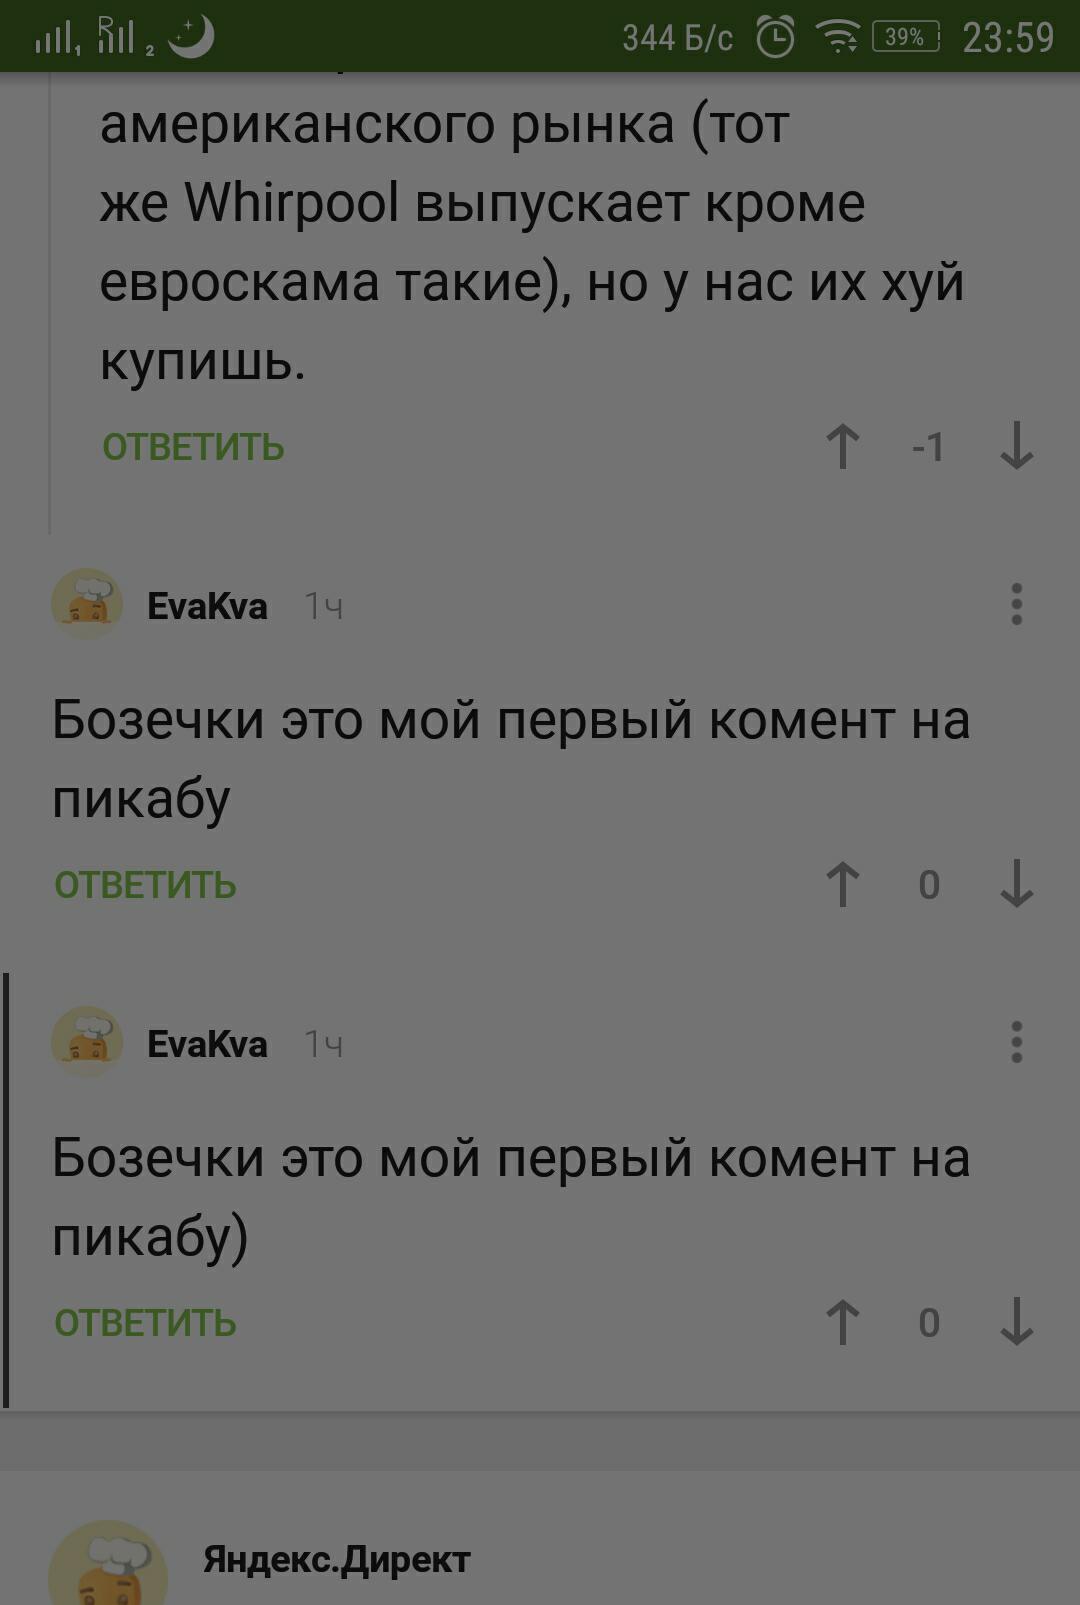 Хуй янденкс